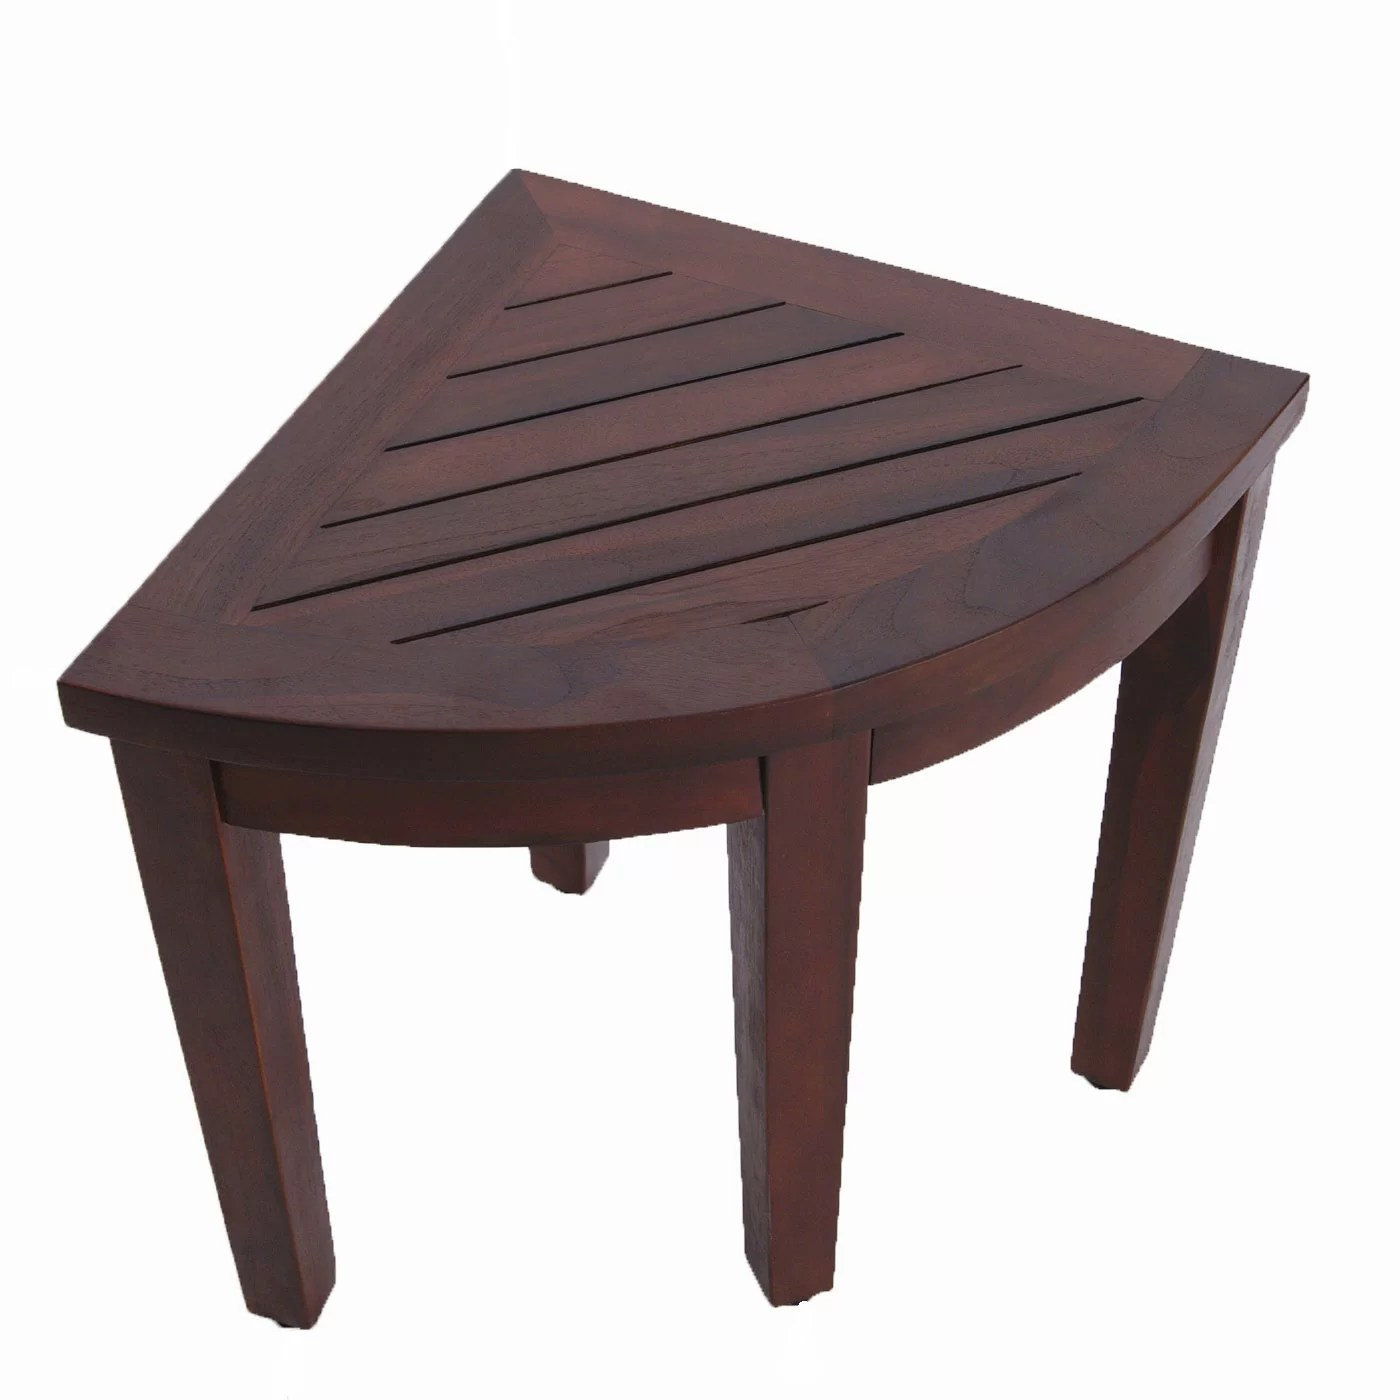 corner shower chair brown folding covers decoteak oasis teak seat stool bench